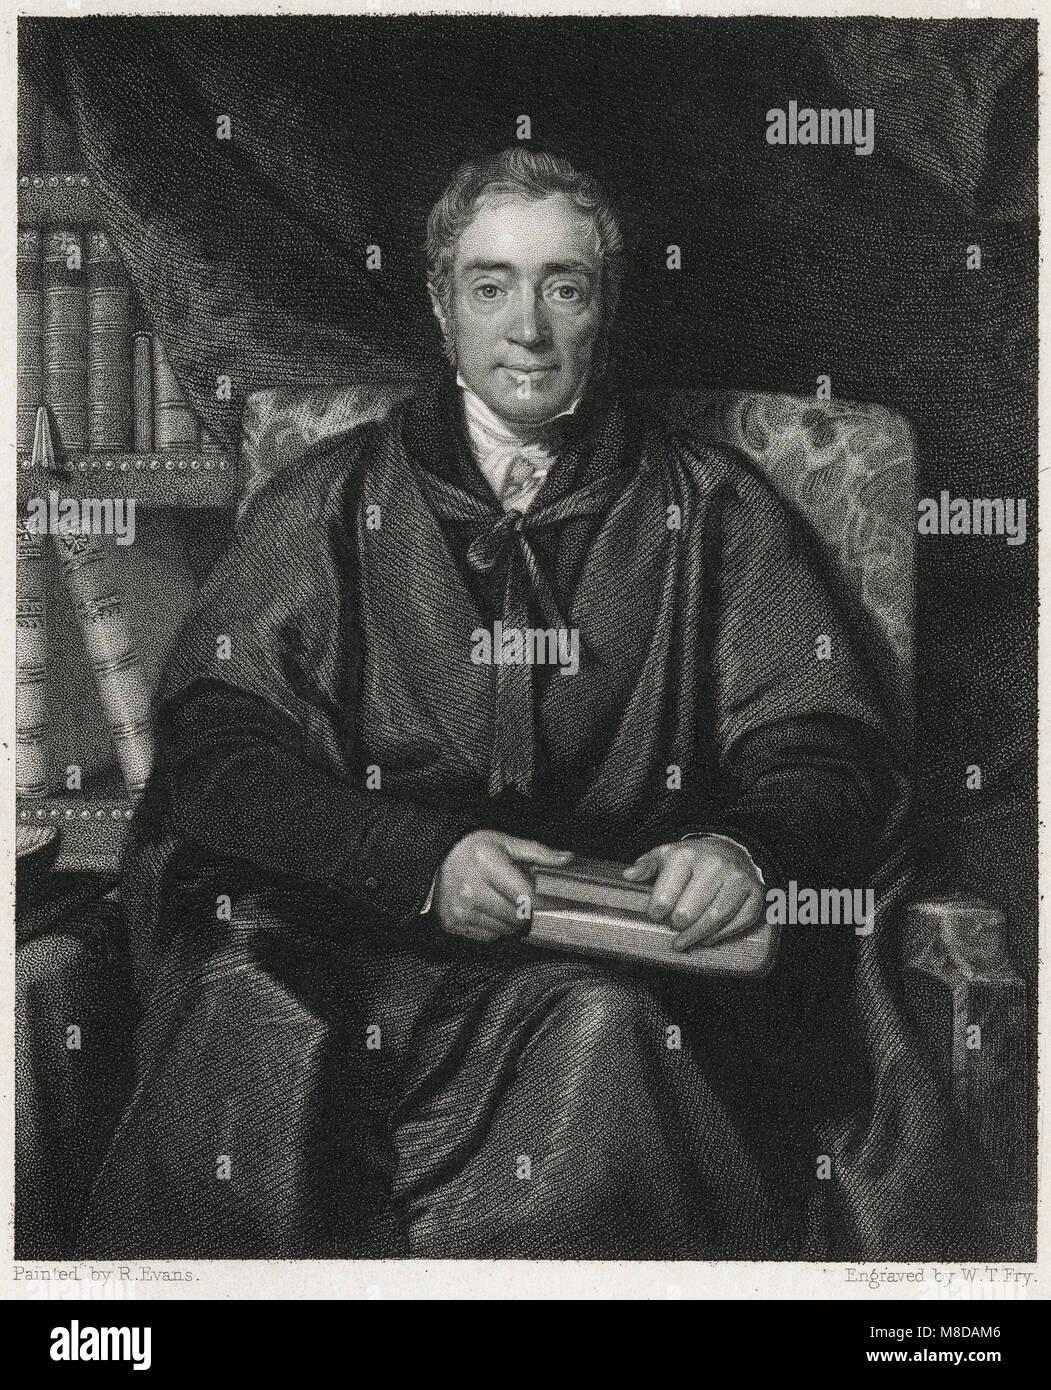 Antique 1833 engraving, Samuel Lee. Samuel Lee (1783-1852) was an English Orientalist, born in Shropshire; professor - Stock Image